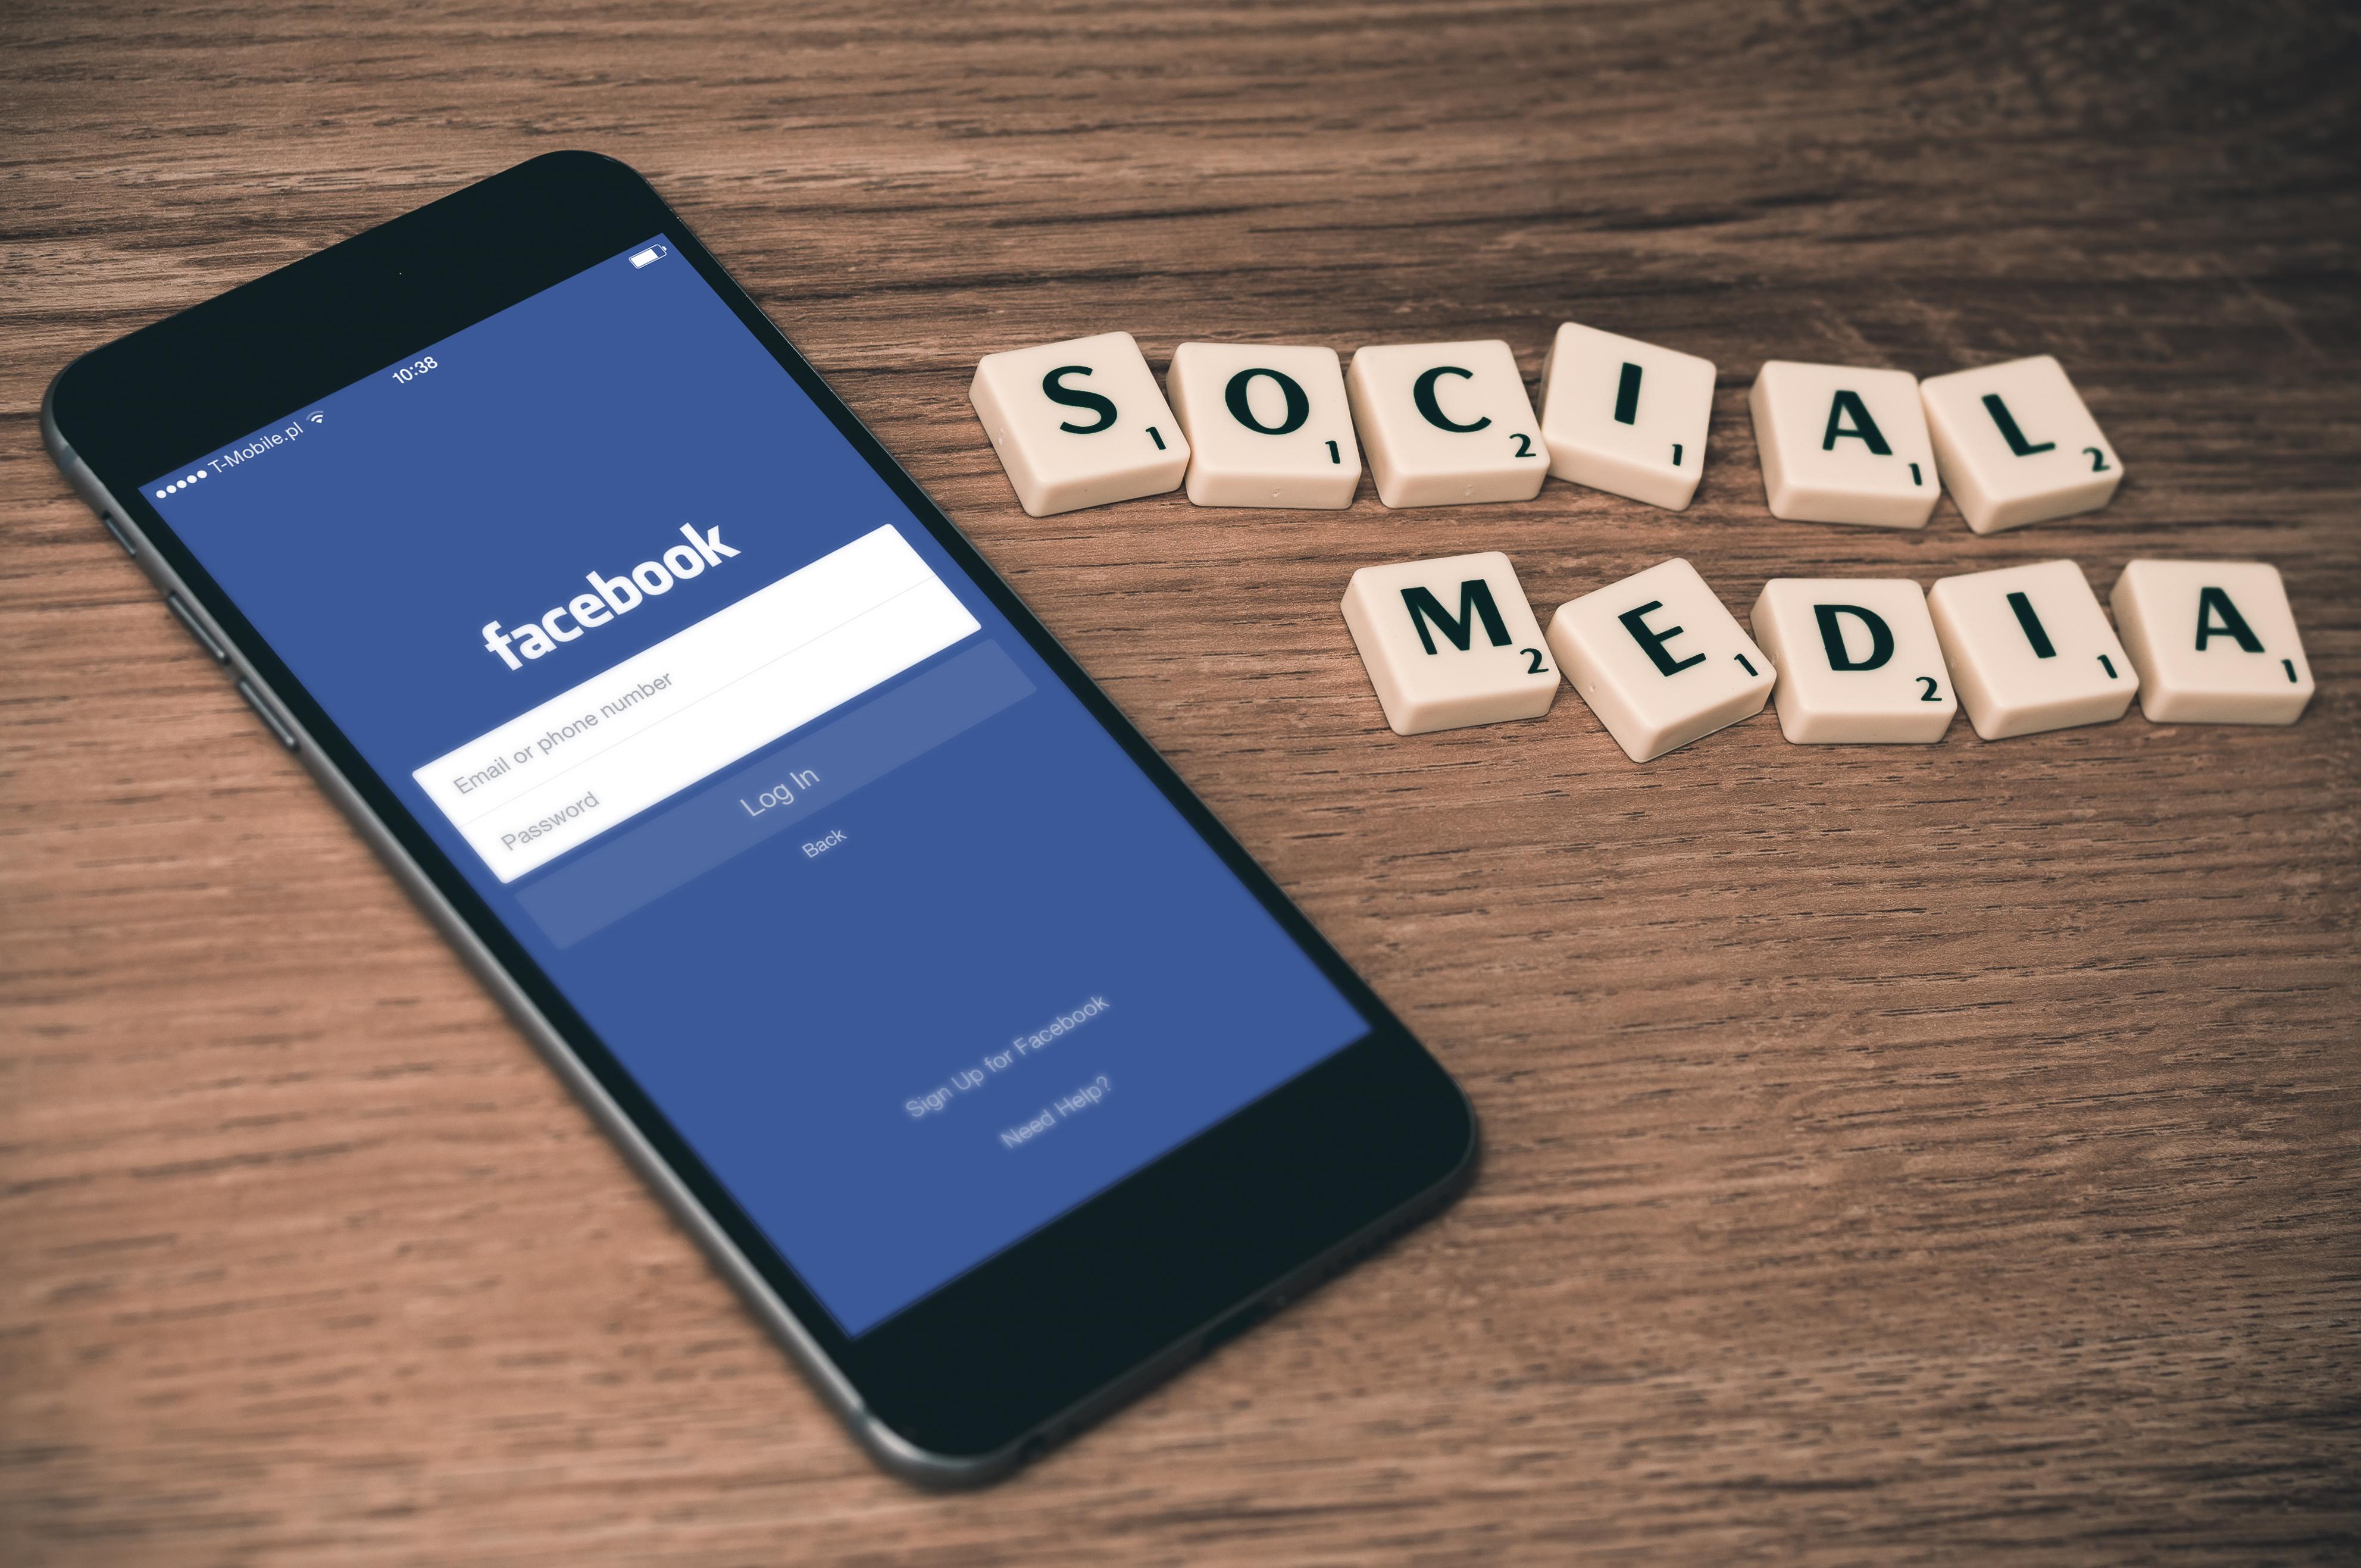 Facebook rumors, censorship, and Pakistan's blasphemy laws